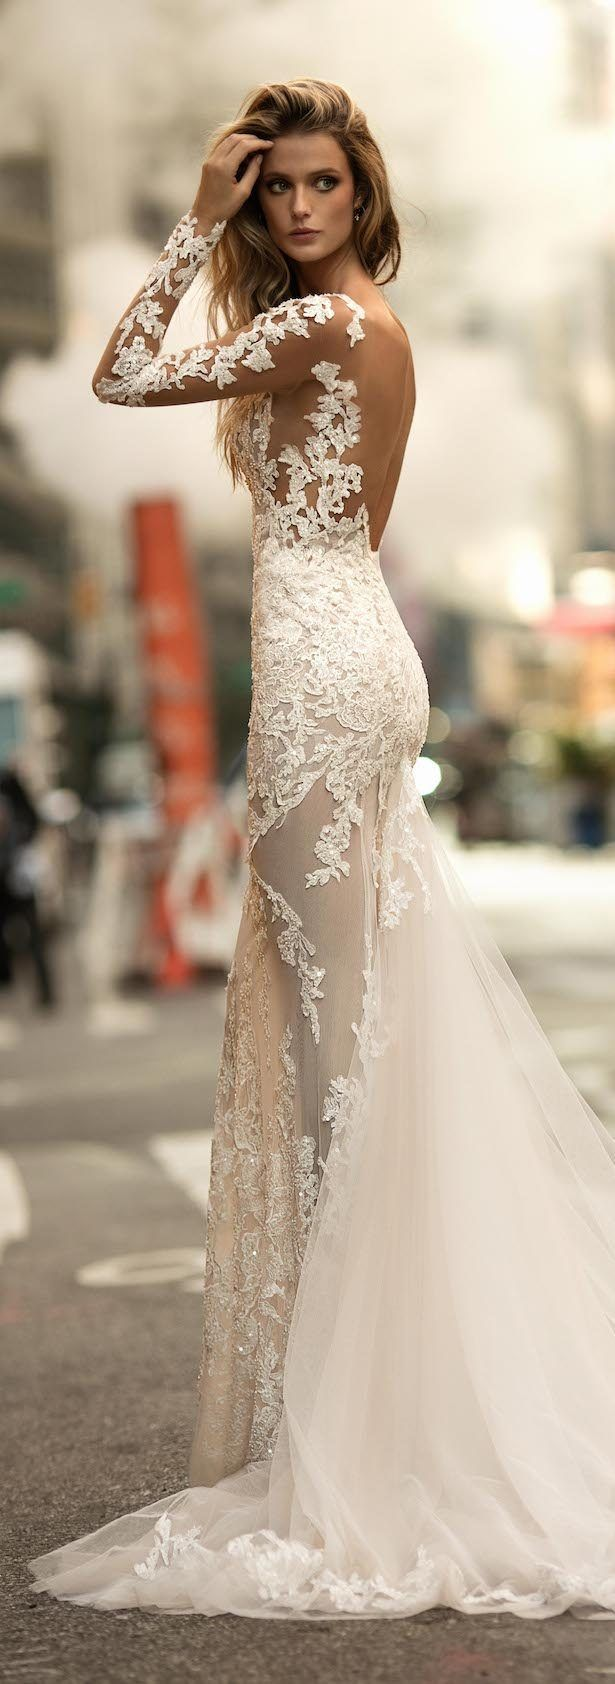 Maggie Sottero Black And White Wedding Dress Skin Tight - Skin Tight ...